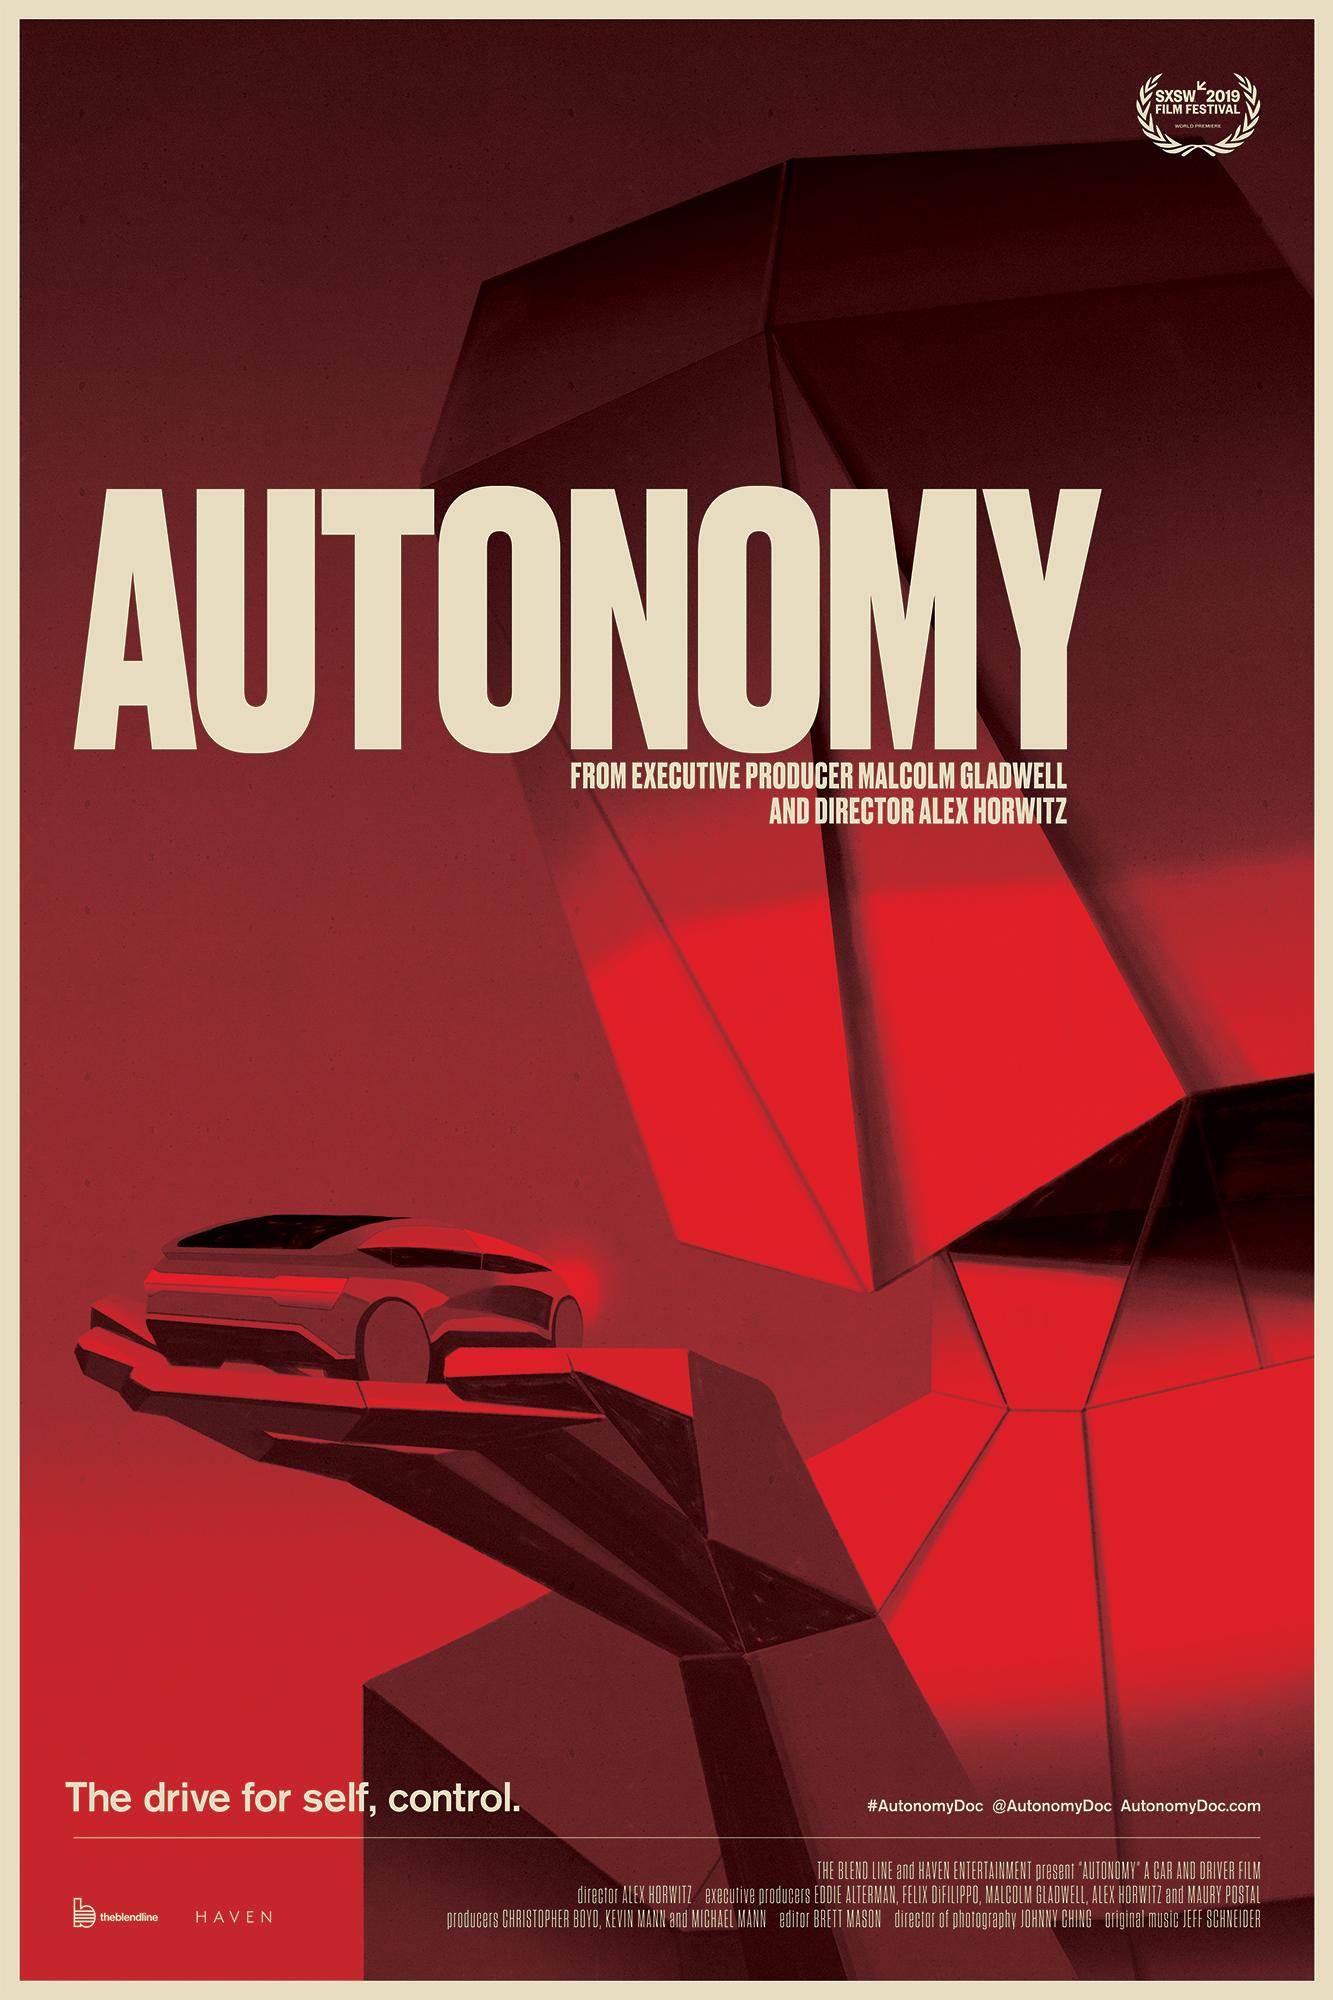 Final_26x39_AutonomyPoster_x1a_LR.jpg